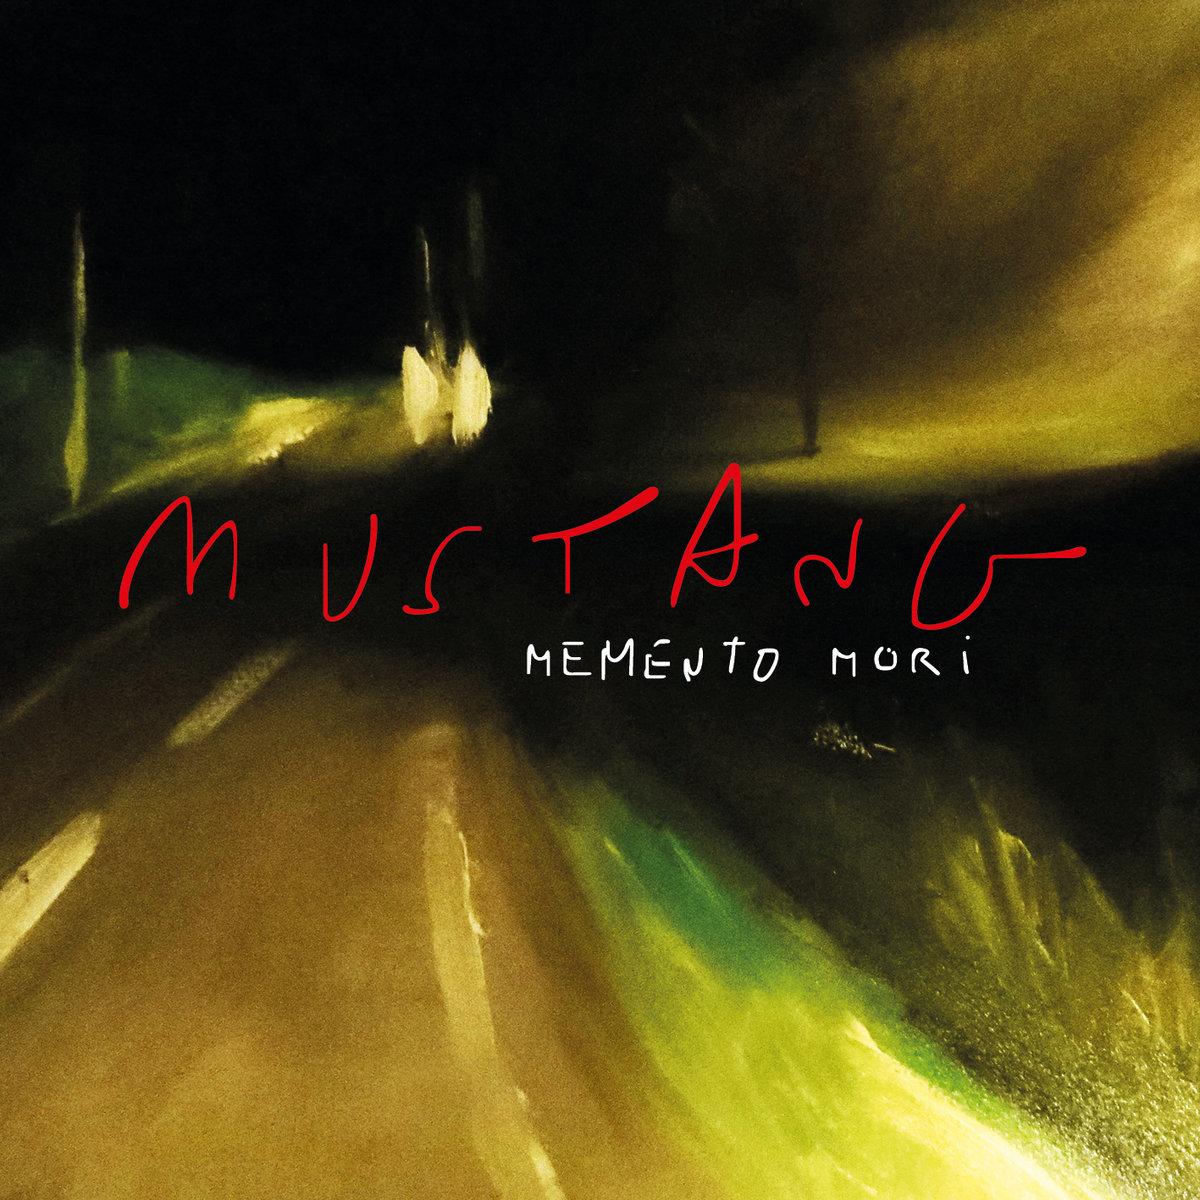 News – Mustang – Memento Mori